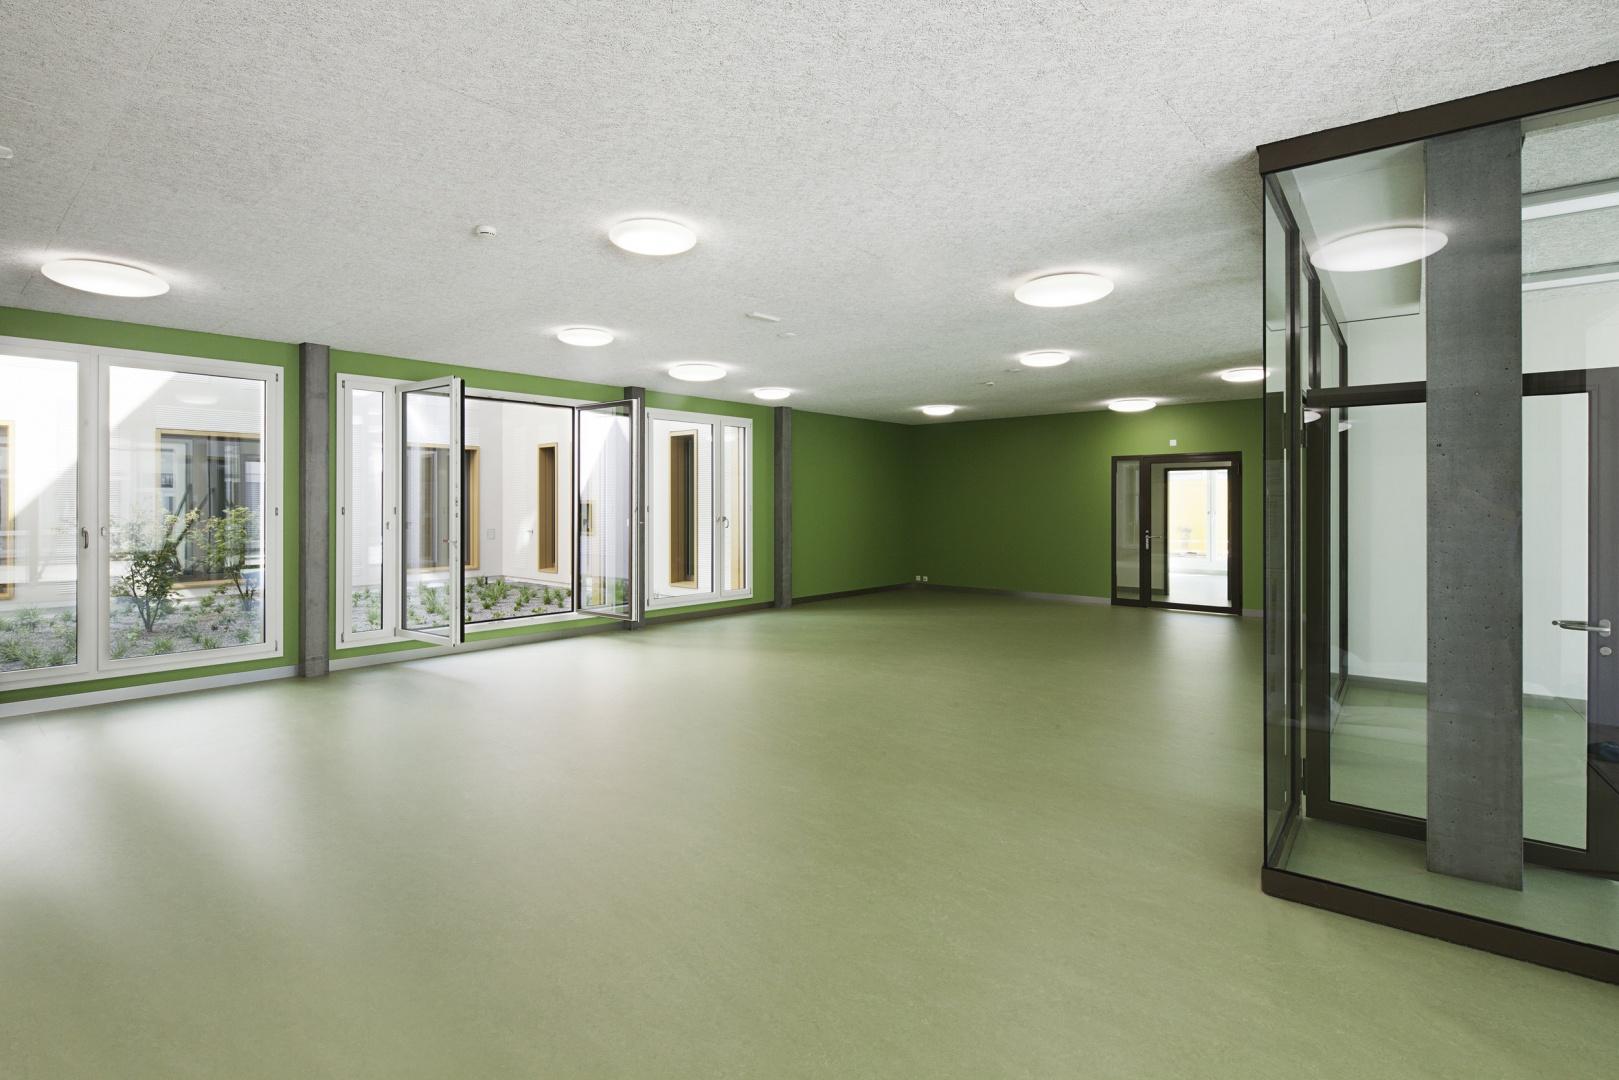 KJPZ_Eingangshalle_EG © Daniel Erne, Horgen